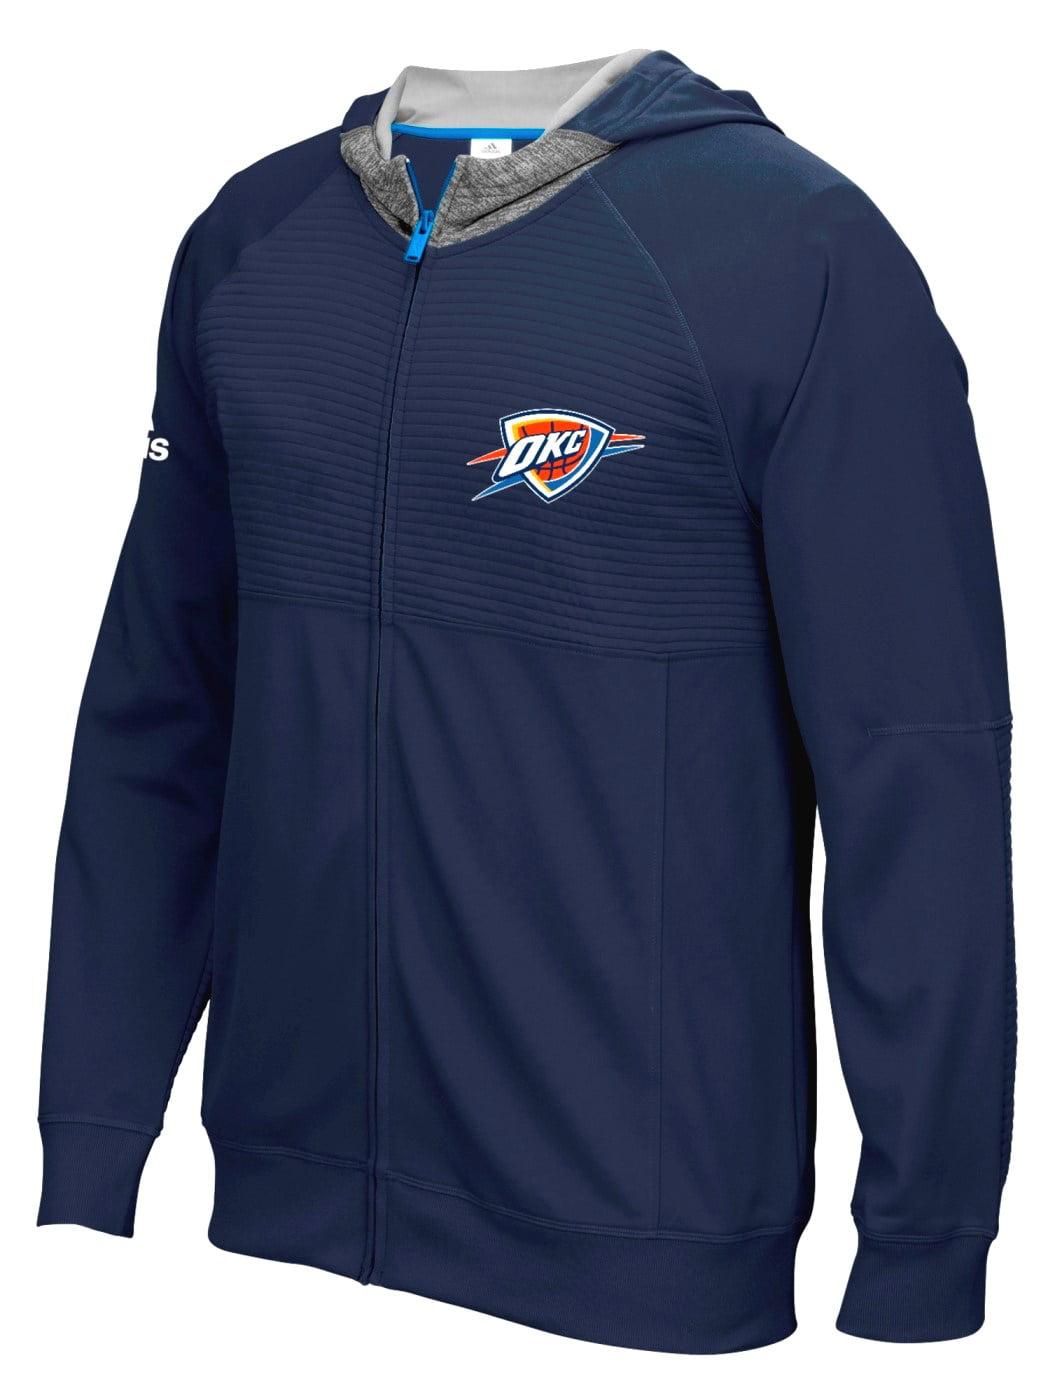 "Oklahoma City Thunder Adidas 2016 NBA On-Court ""Pre-Game"" Full Zip Hooded Jacket by Adidas"